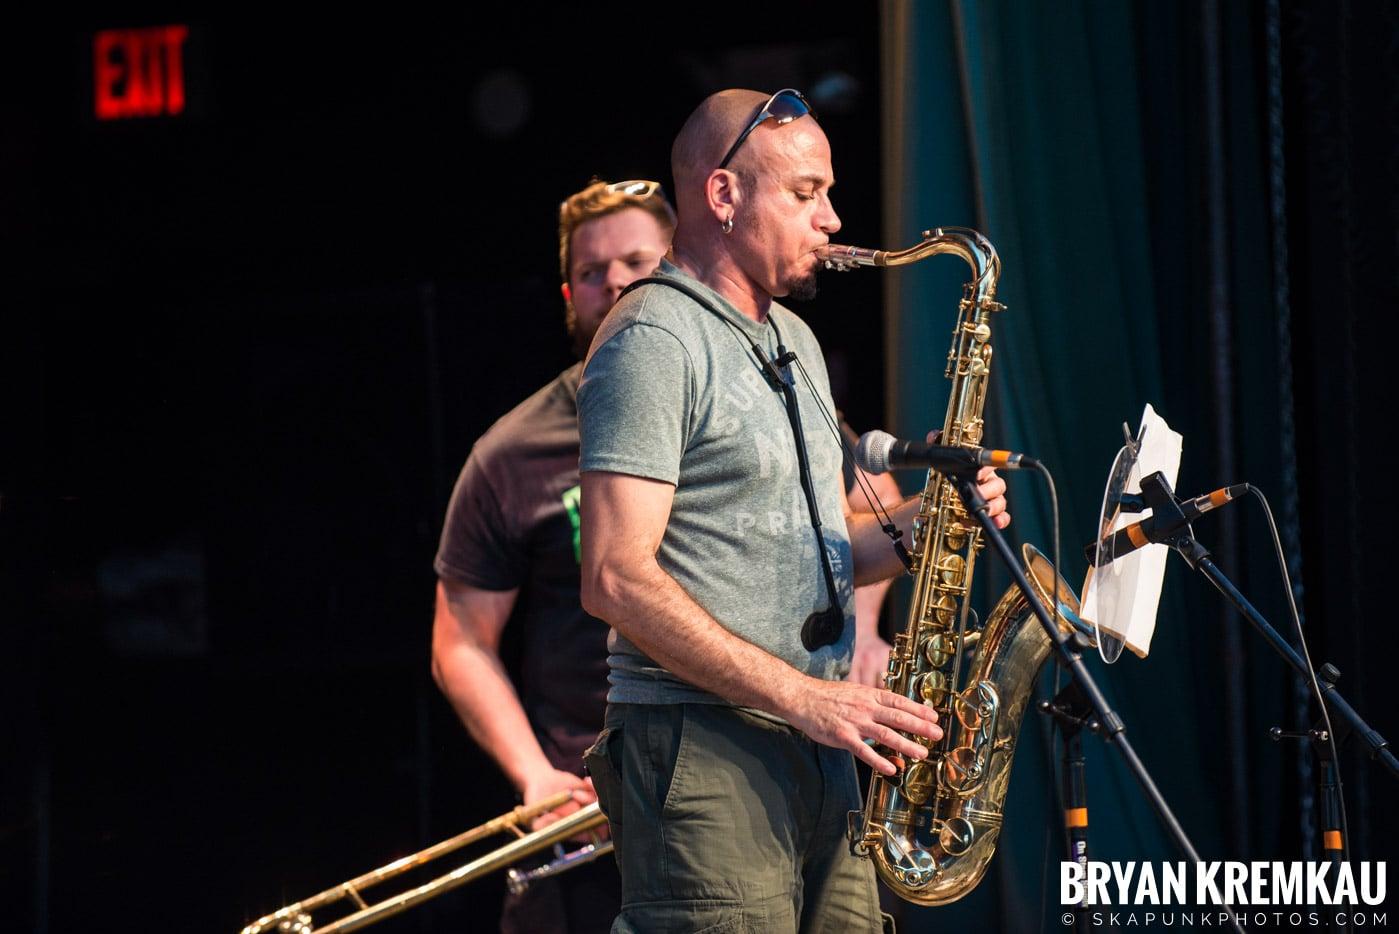 The Rudie Crew @ Oskar Schindler Performing Arts Center, West Orange, NJ - 8.19.17 (19)